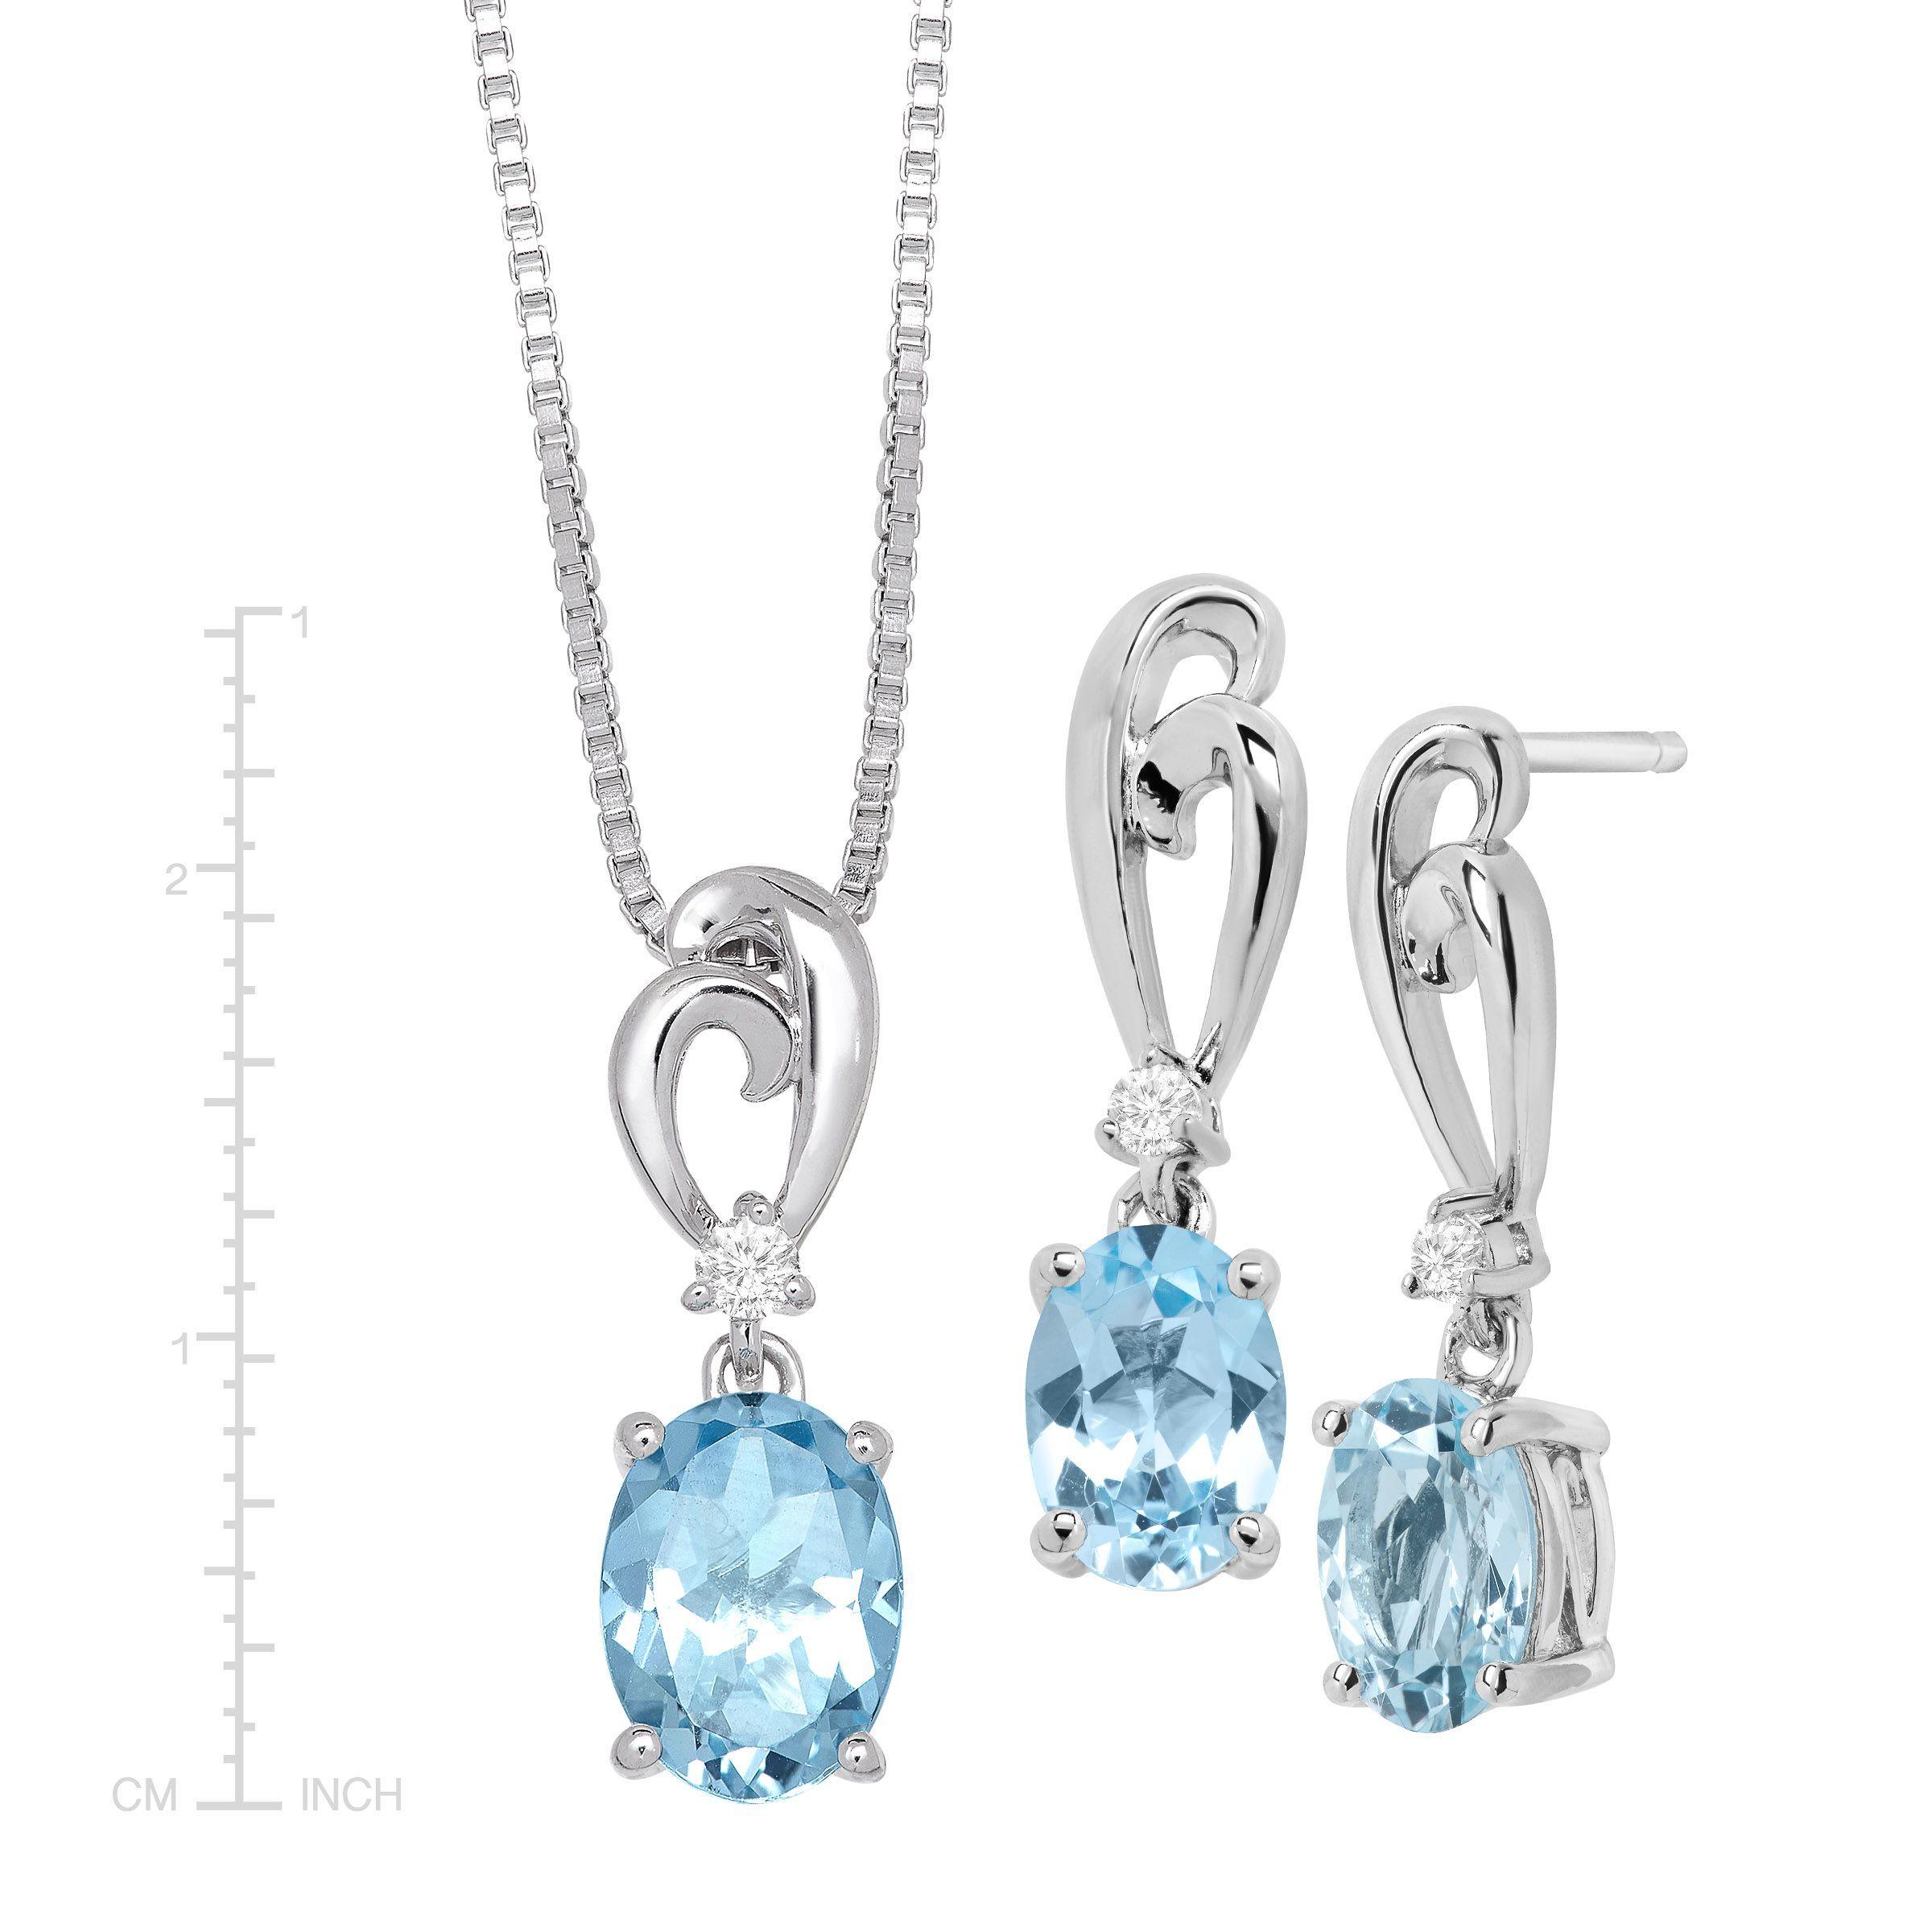 RUDRAFASHION Pear Shape Blue Sapphire /& White CZ Diamond 14k Yellow Gold Plated 925 Sterling Silver Teardrop Jewelry Set Earrings Pendant Necklace